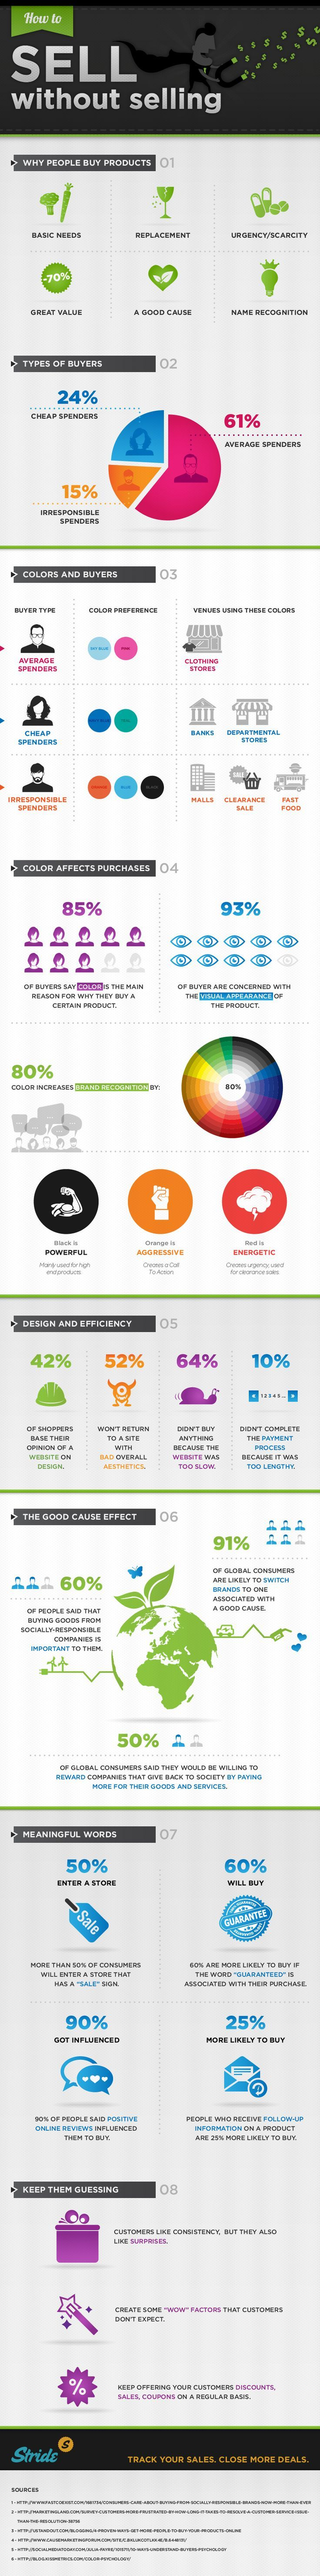 best online business images on pinterest online business